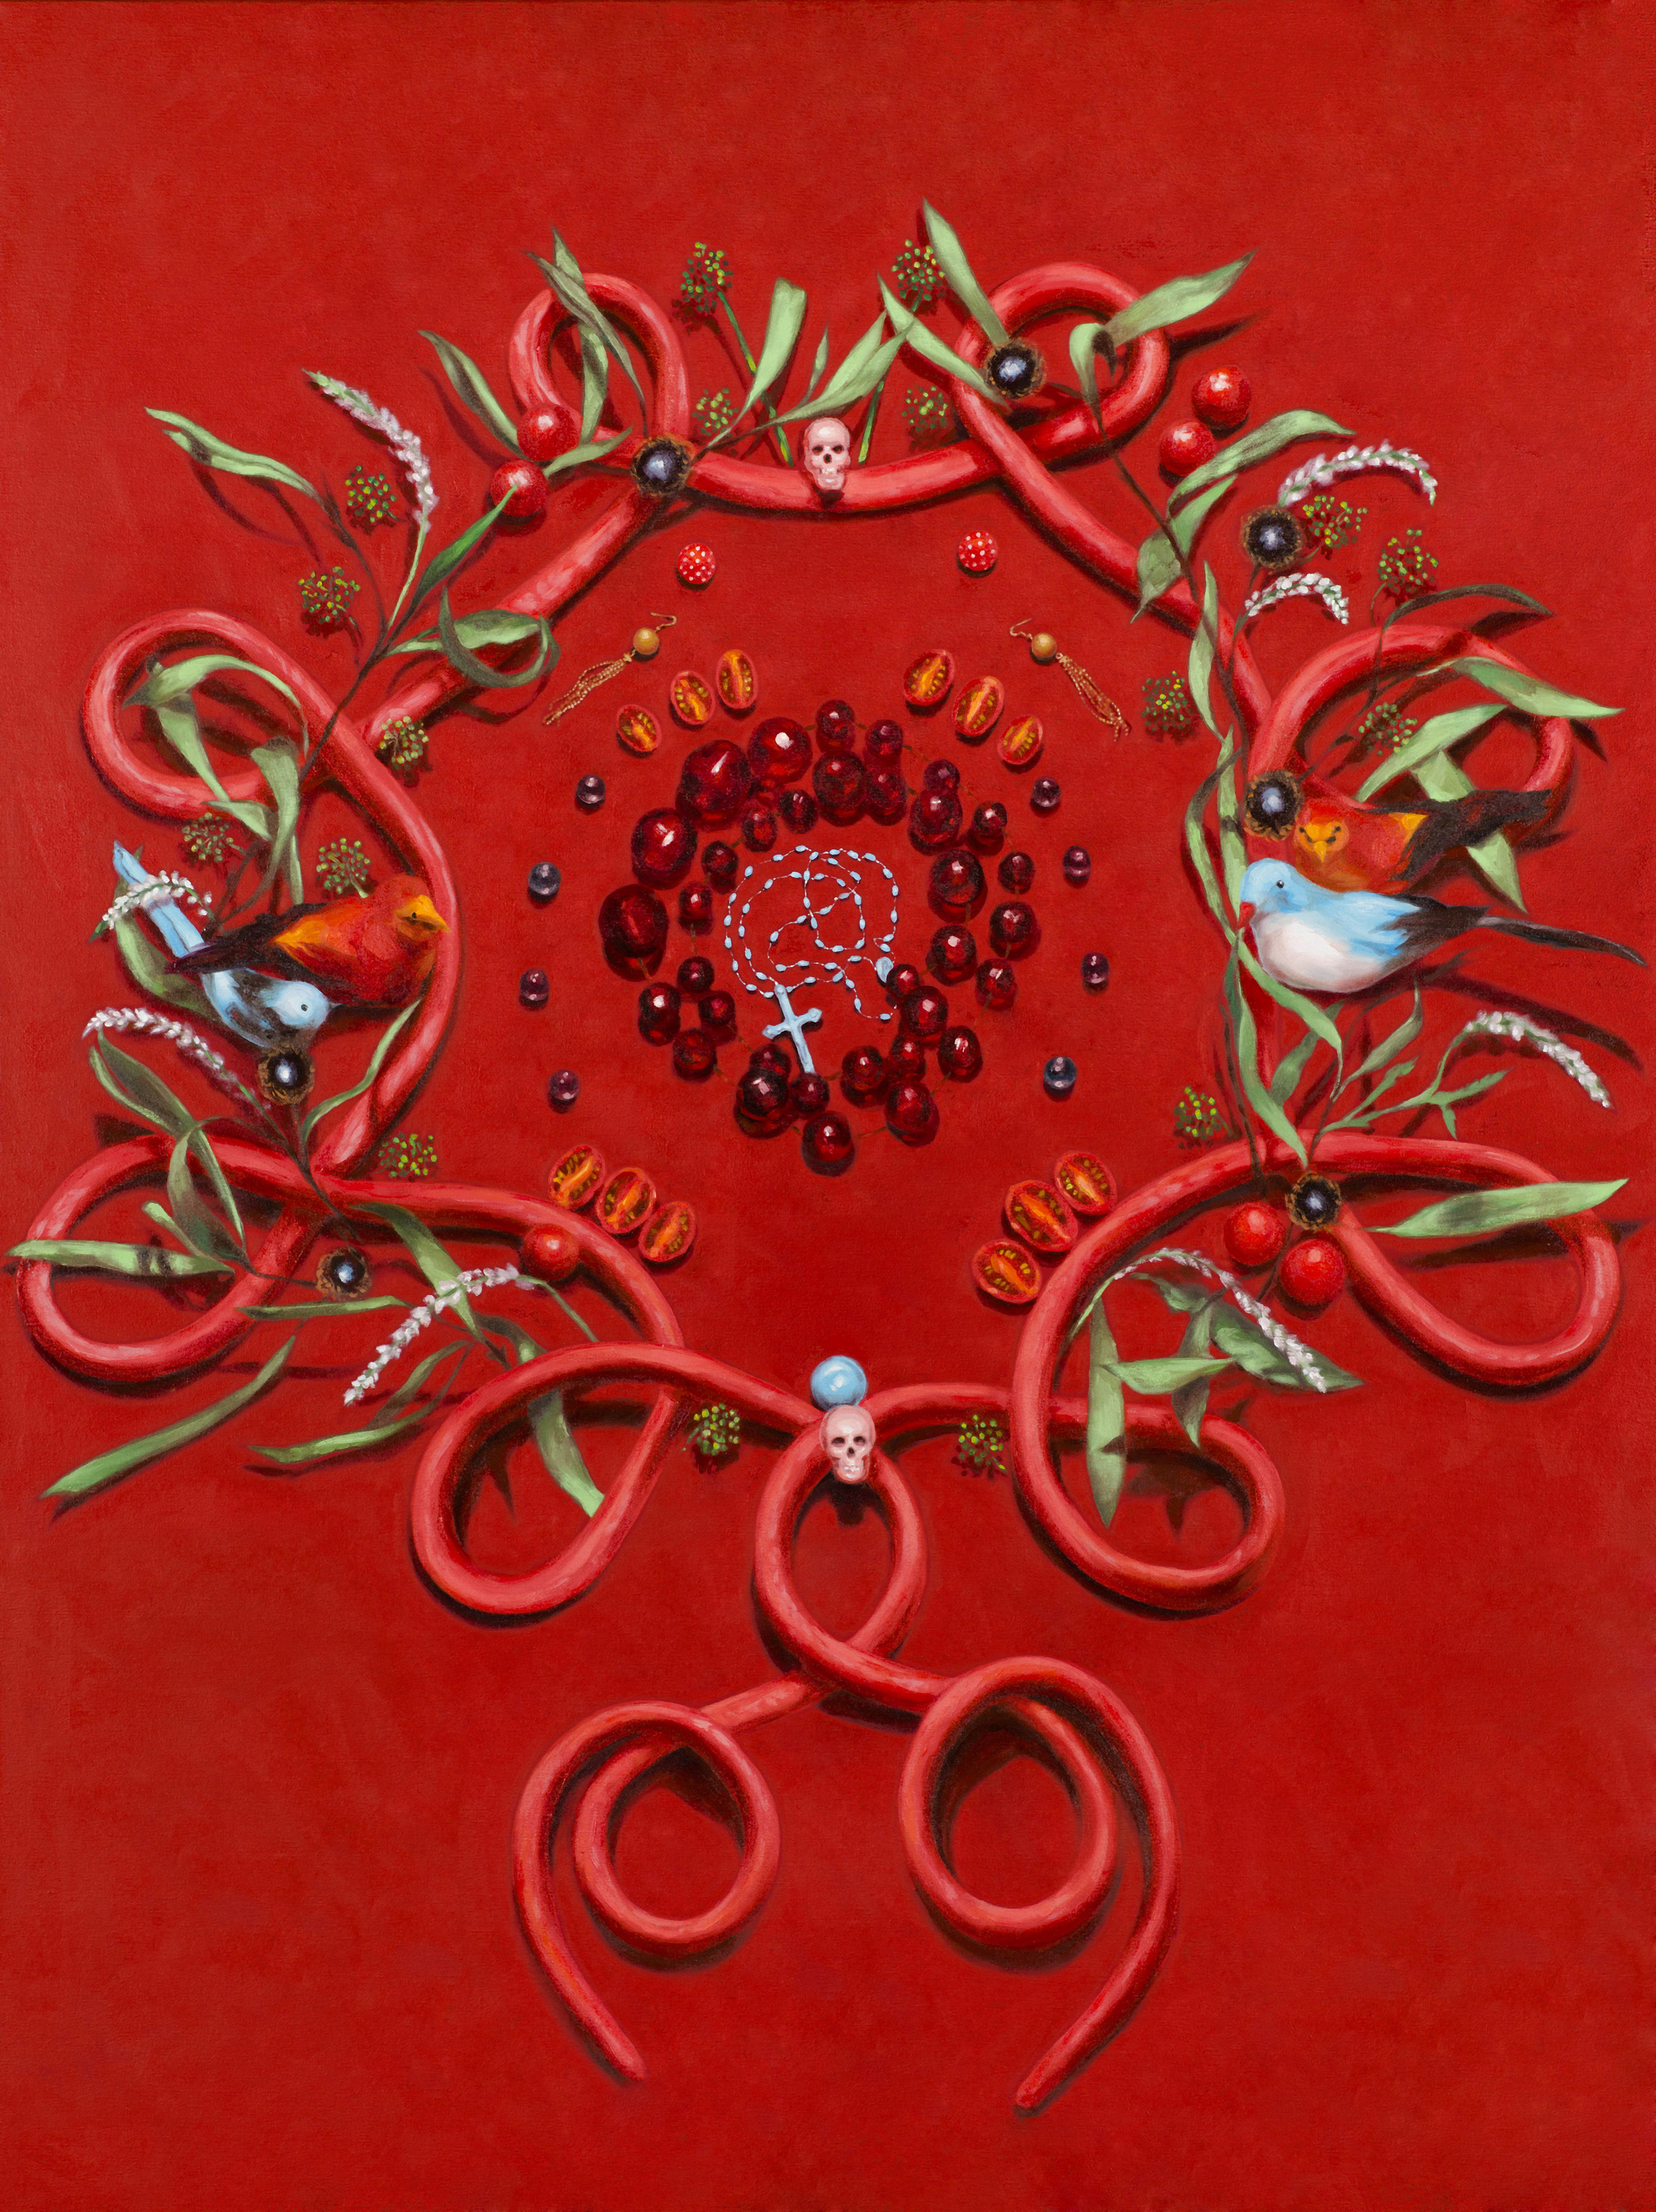 Ruby Chew, Australian Mandala, Oil and Acrylic on Canvas, 122 x 91 cm, 2014